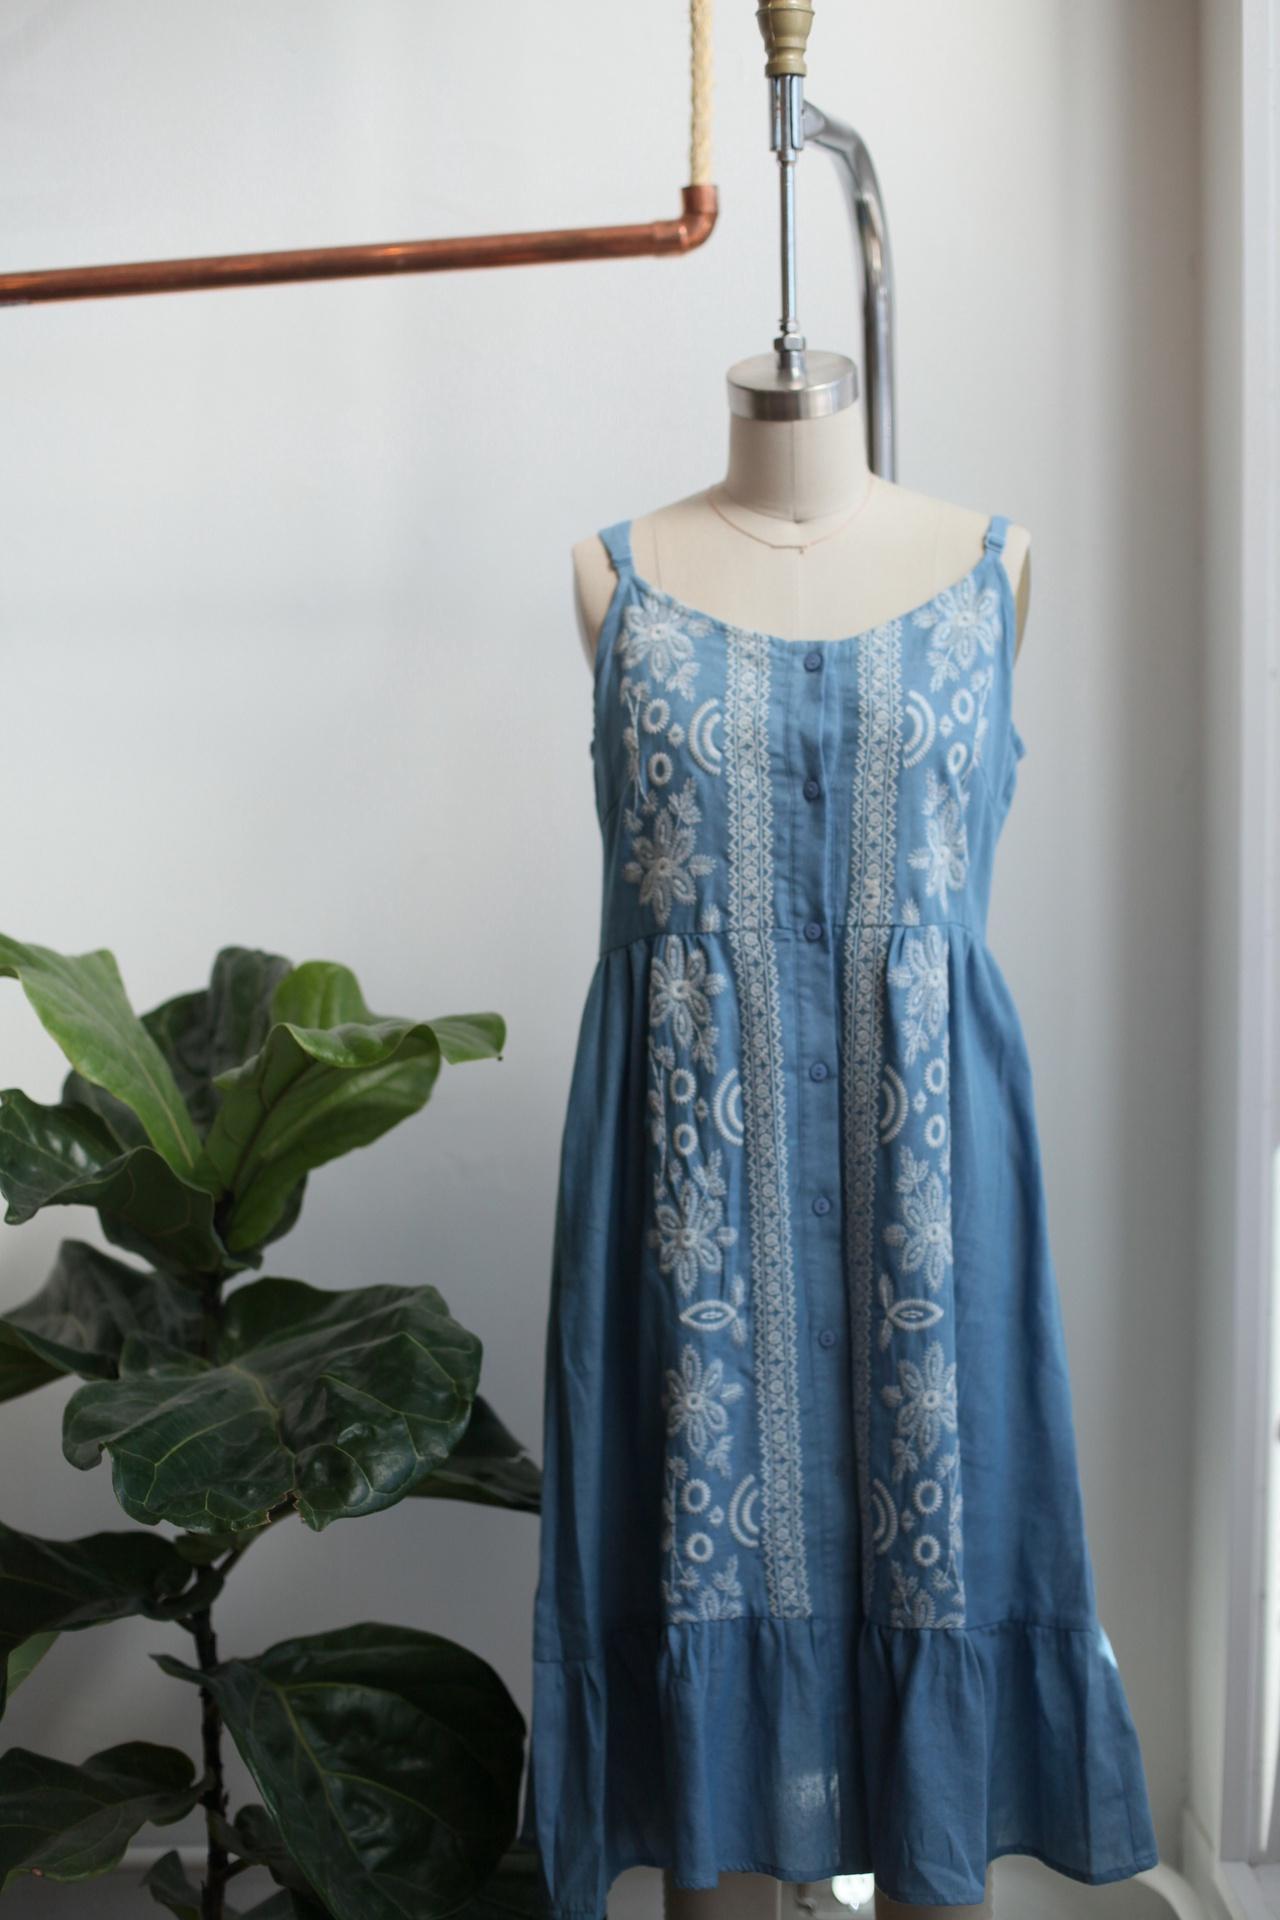 Blooming Blue Dress